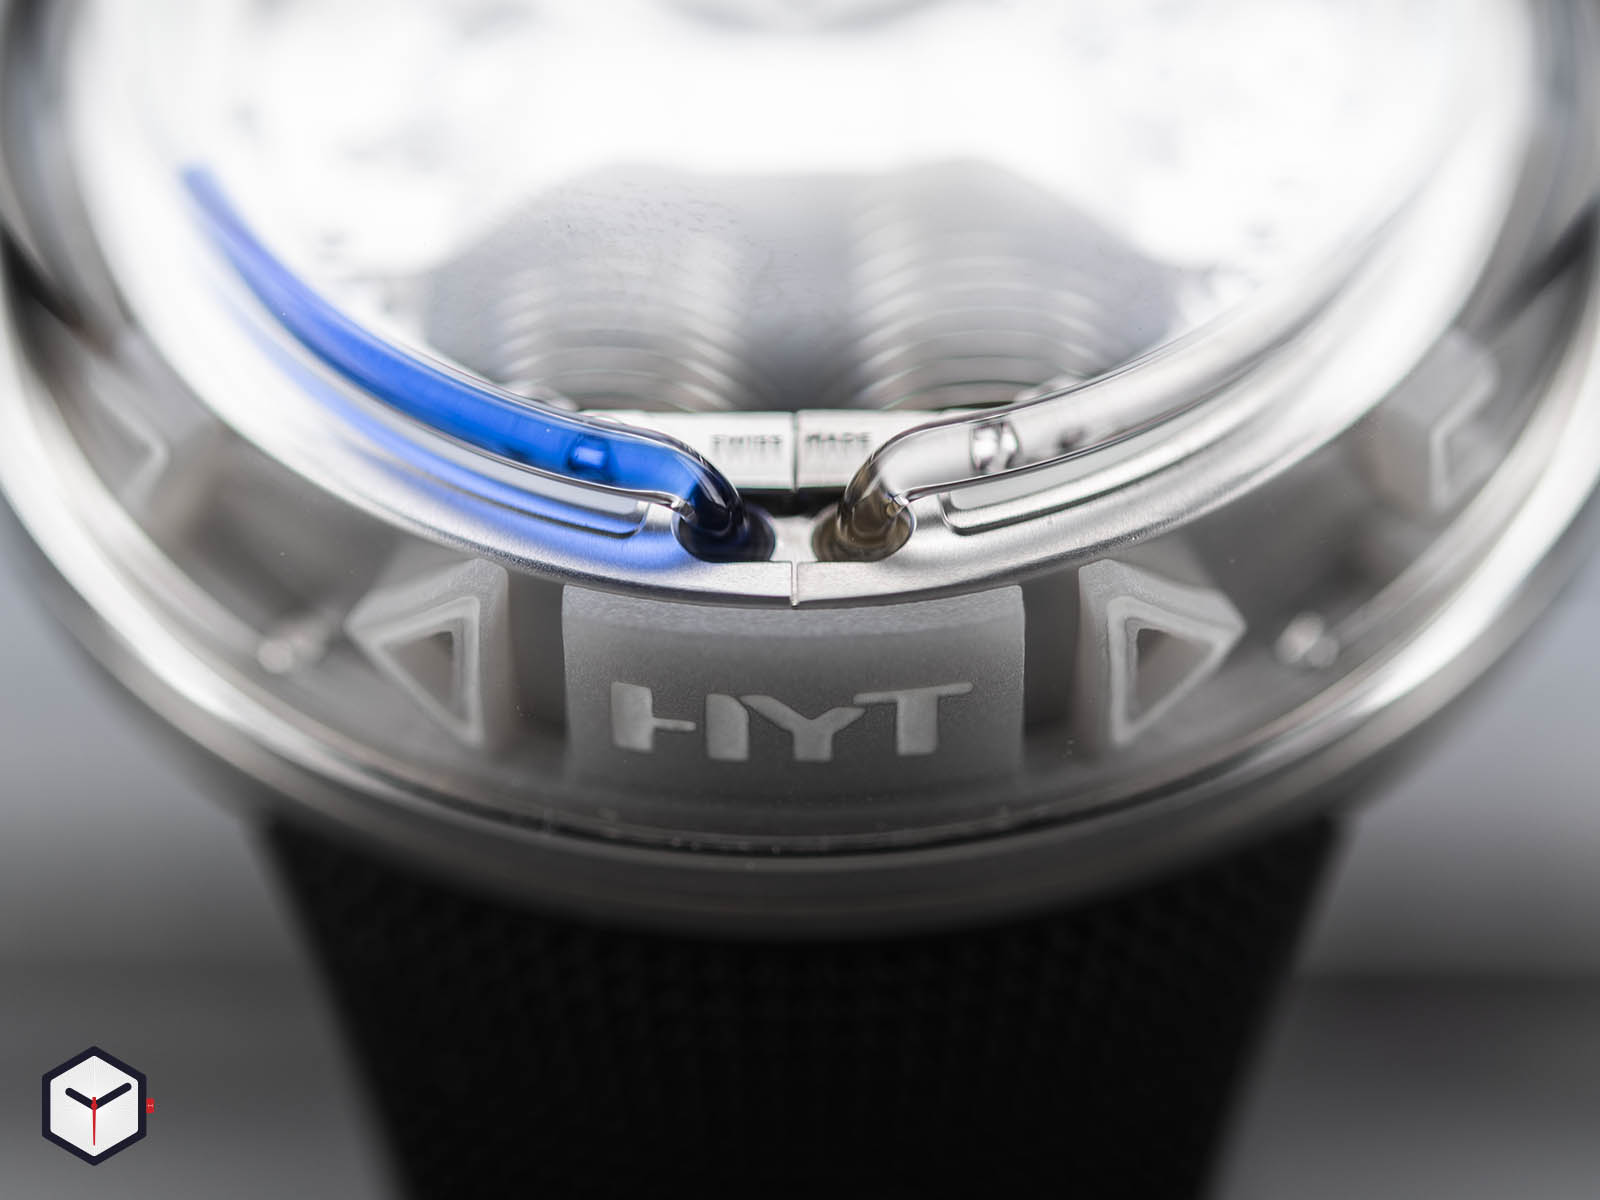 -hyt-h5-horobox-limited-edition-8.jpg